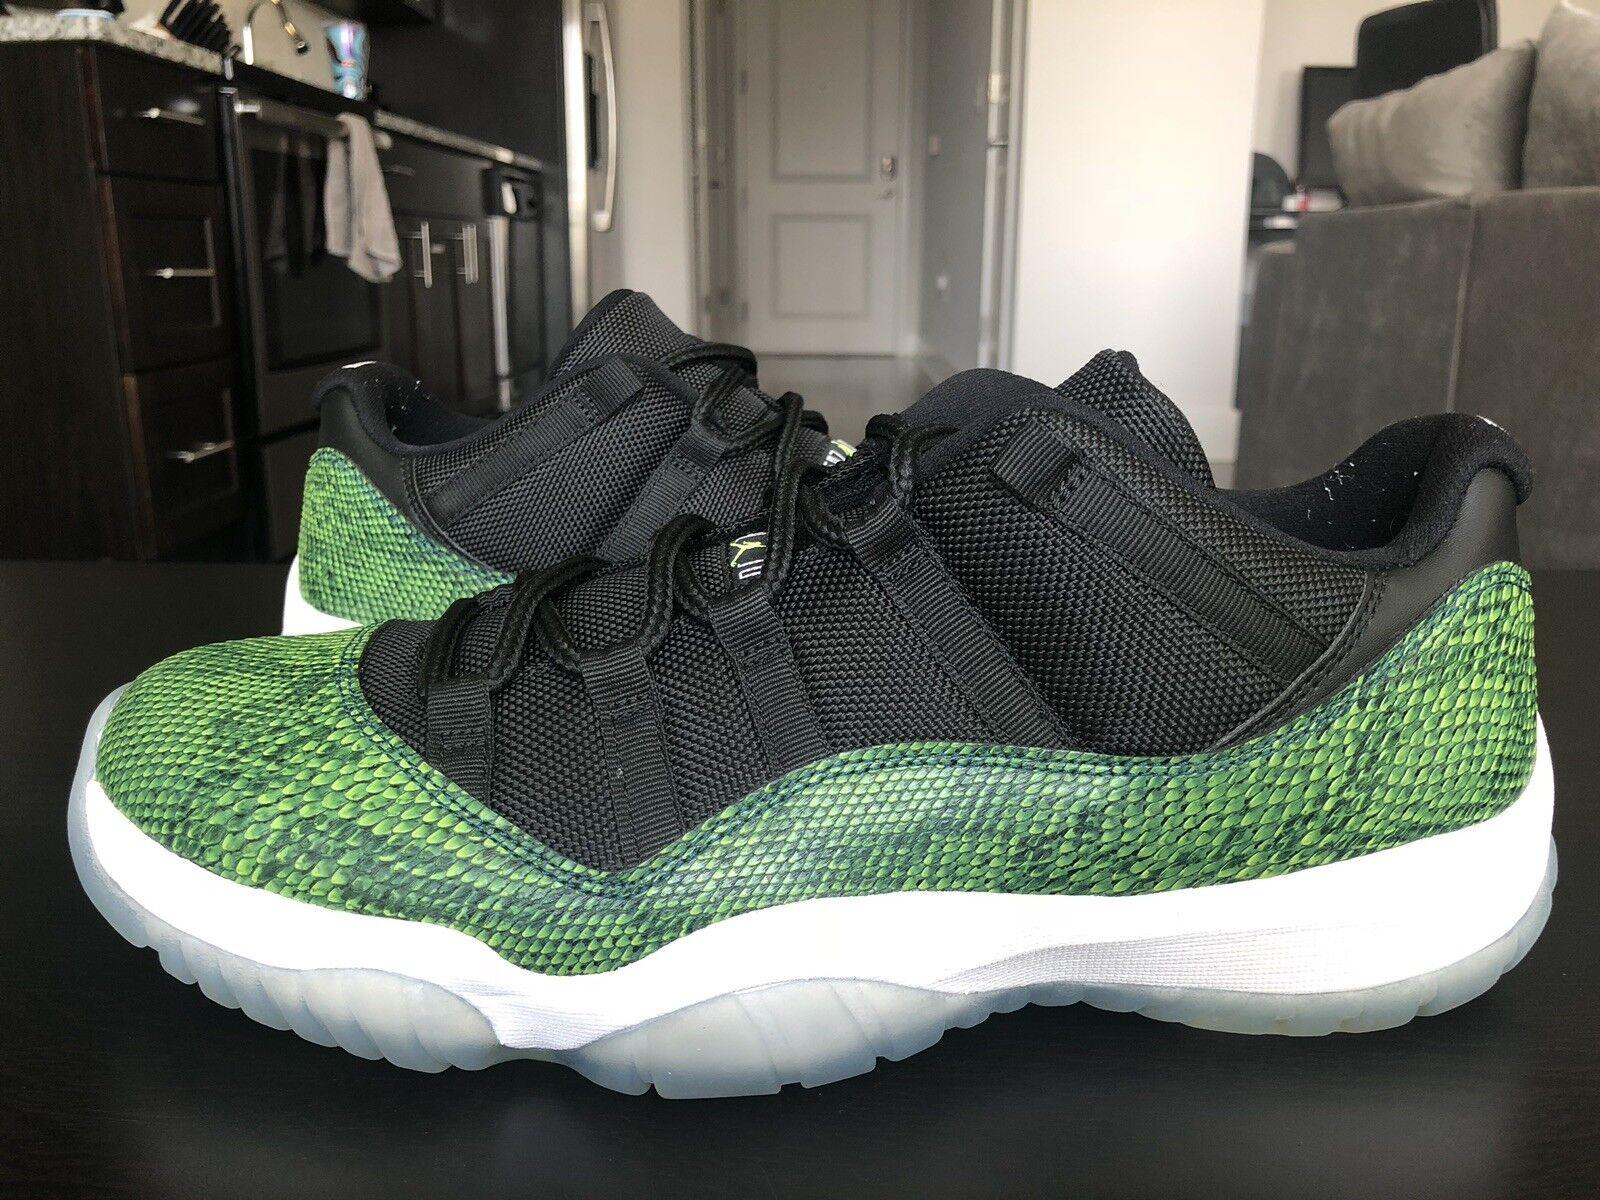 Nike air jordan retro - - - xi 11 geringer  10,5 nachtschatten grne schlangenhaut 528895-033 013cb3